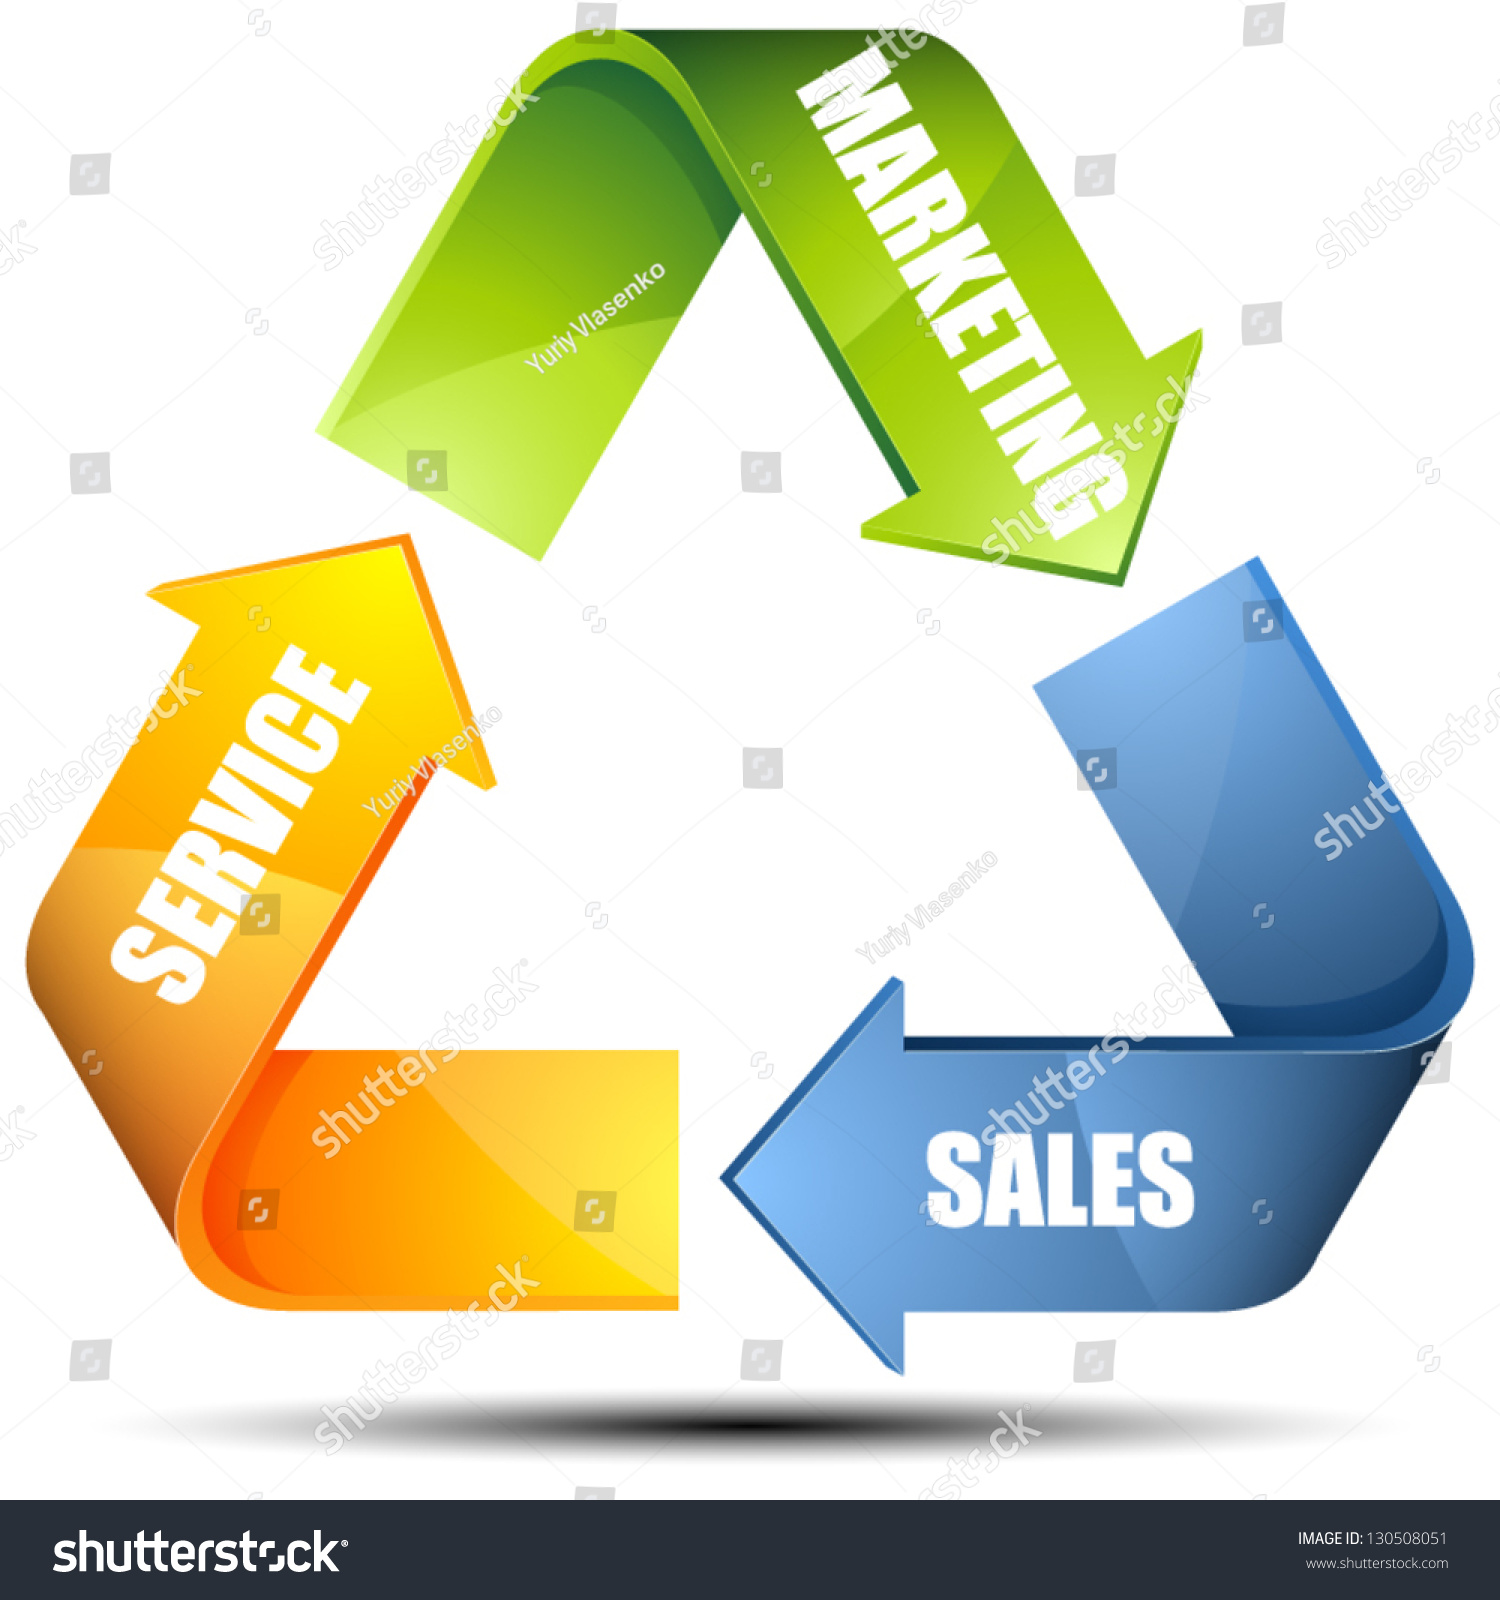 Marketing Sales: Marketing Sales Service Cycle Stock Vector 130508051